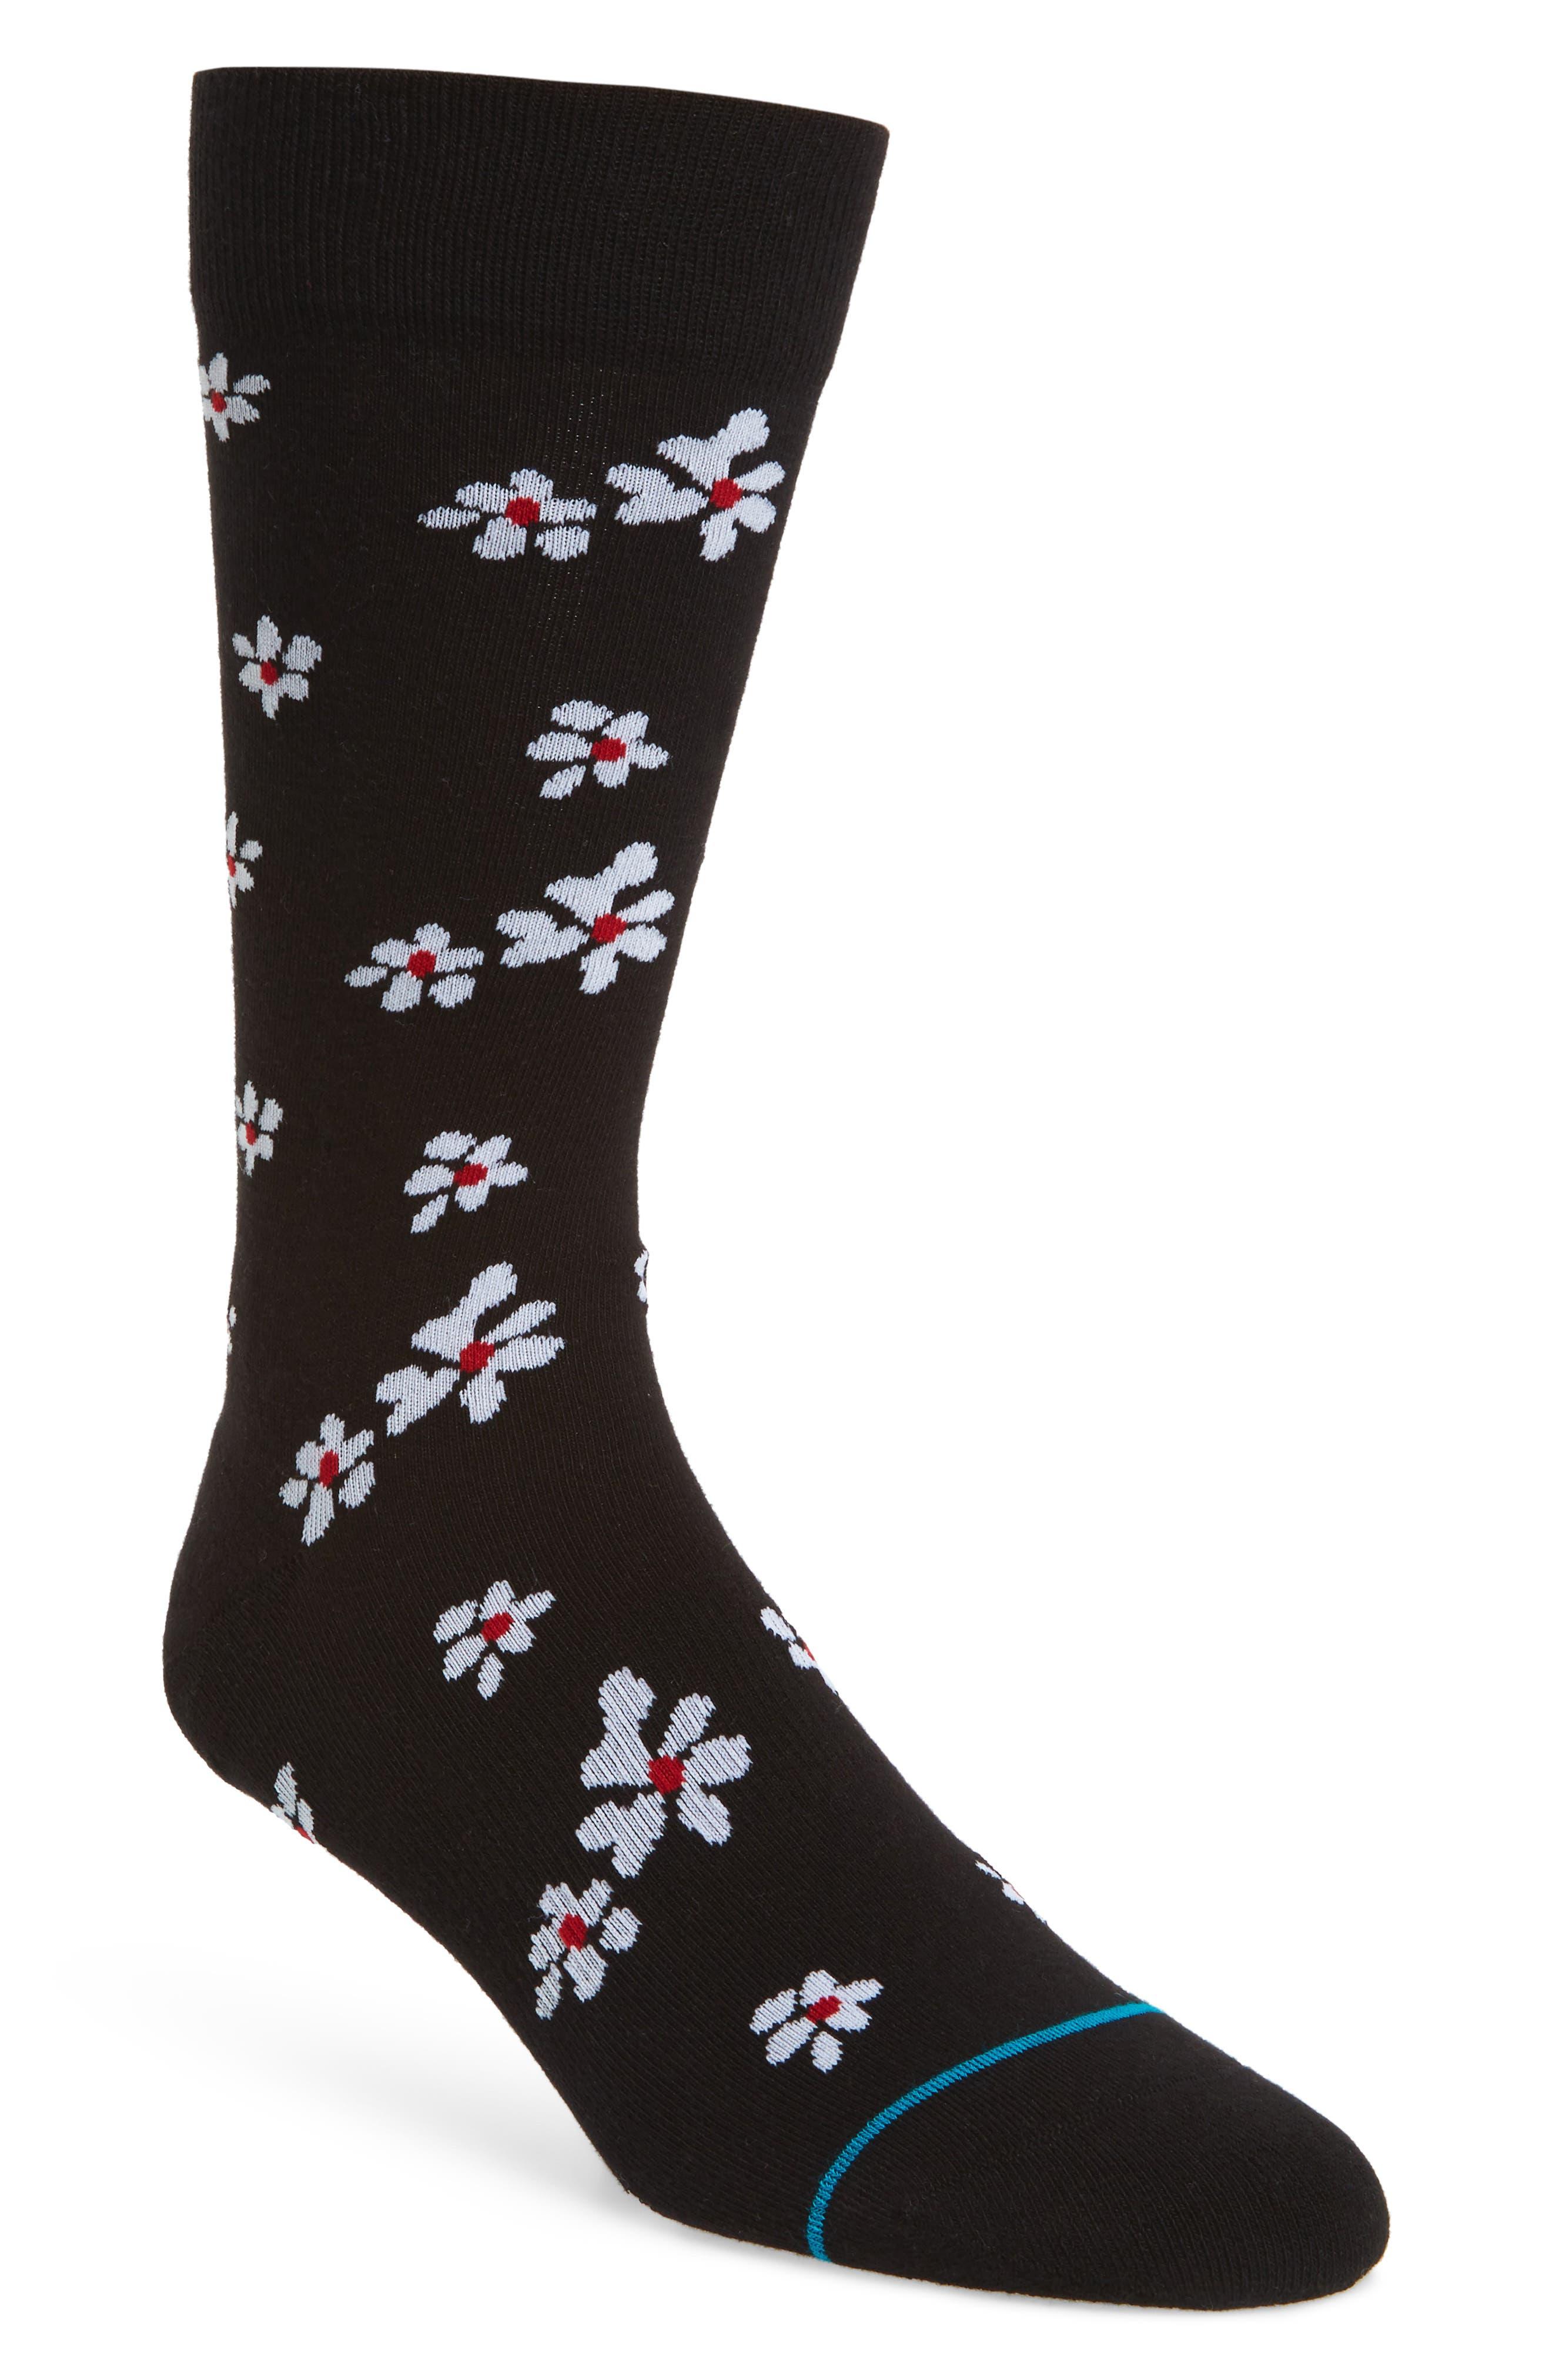 Hendriksen Crew Socks,                         Main,                         color,